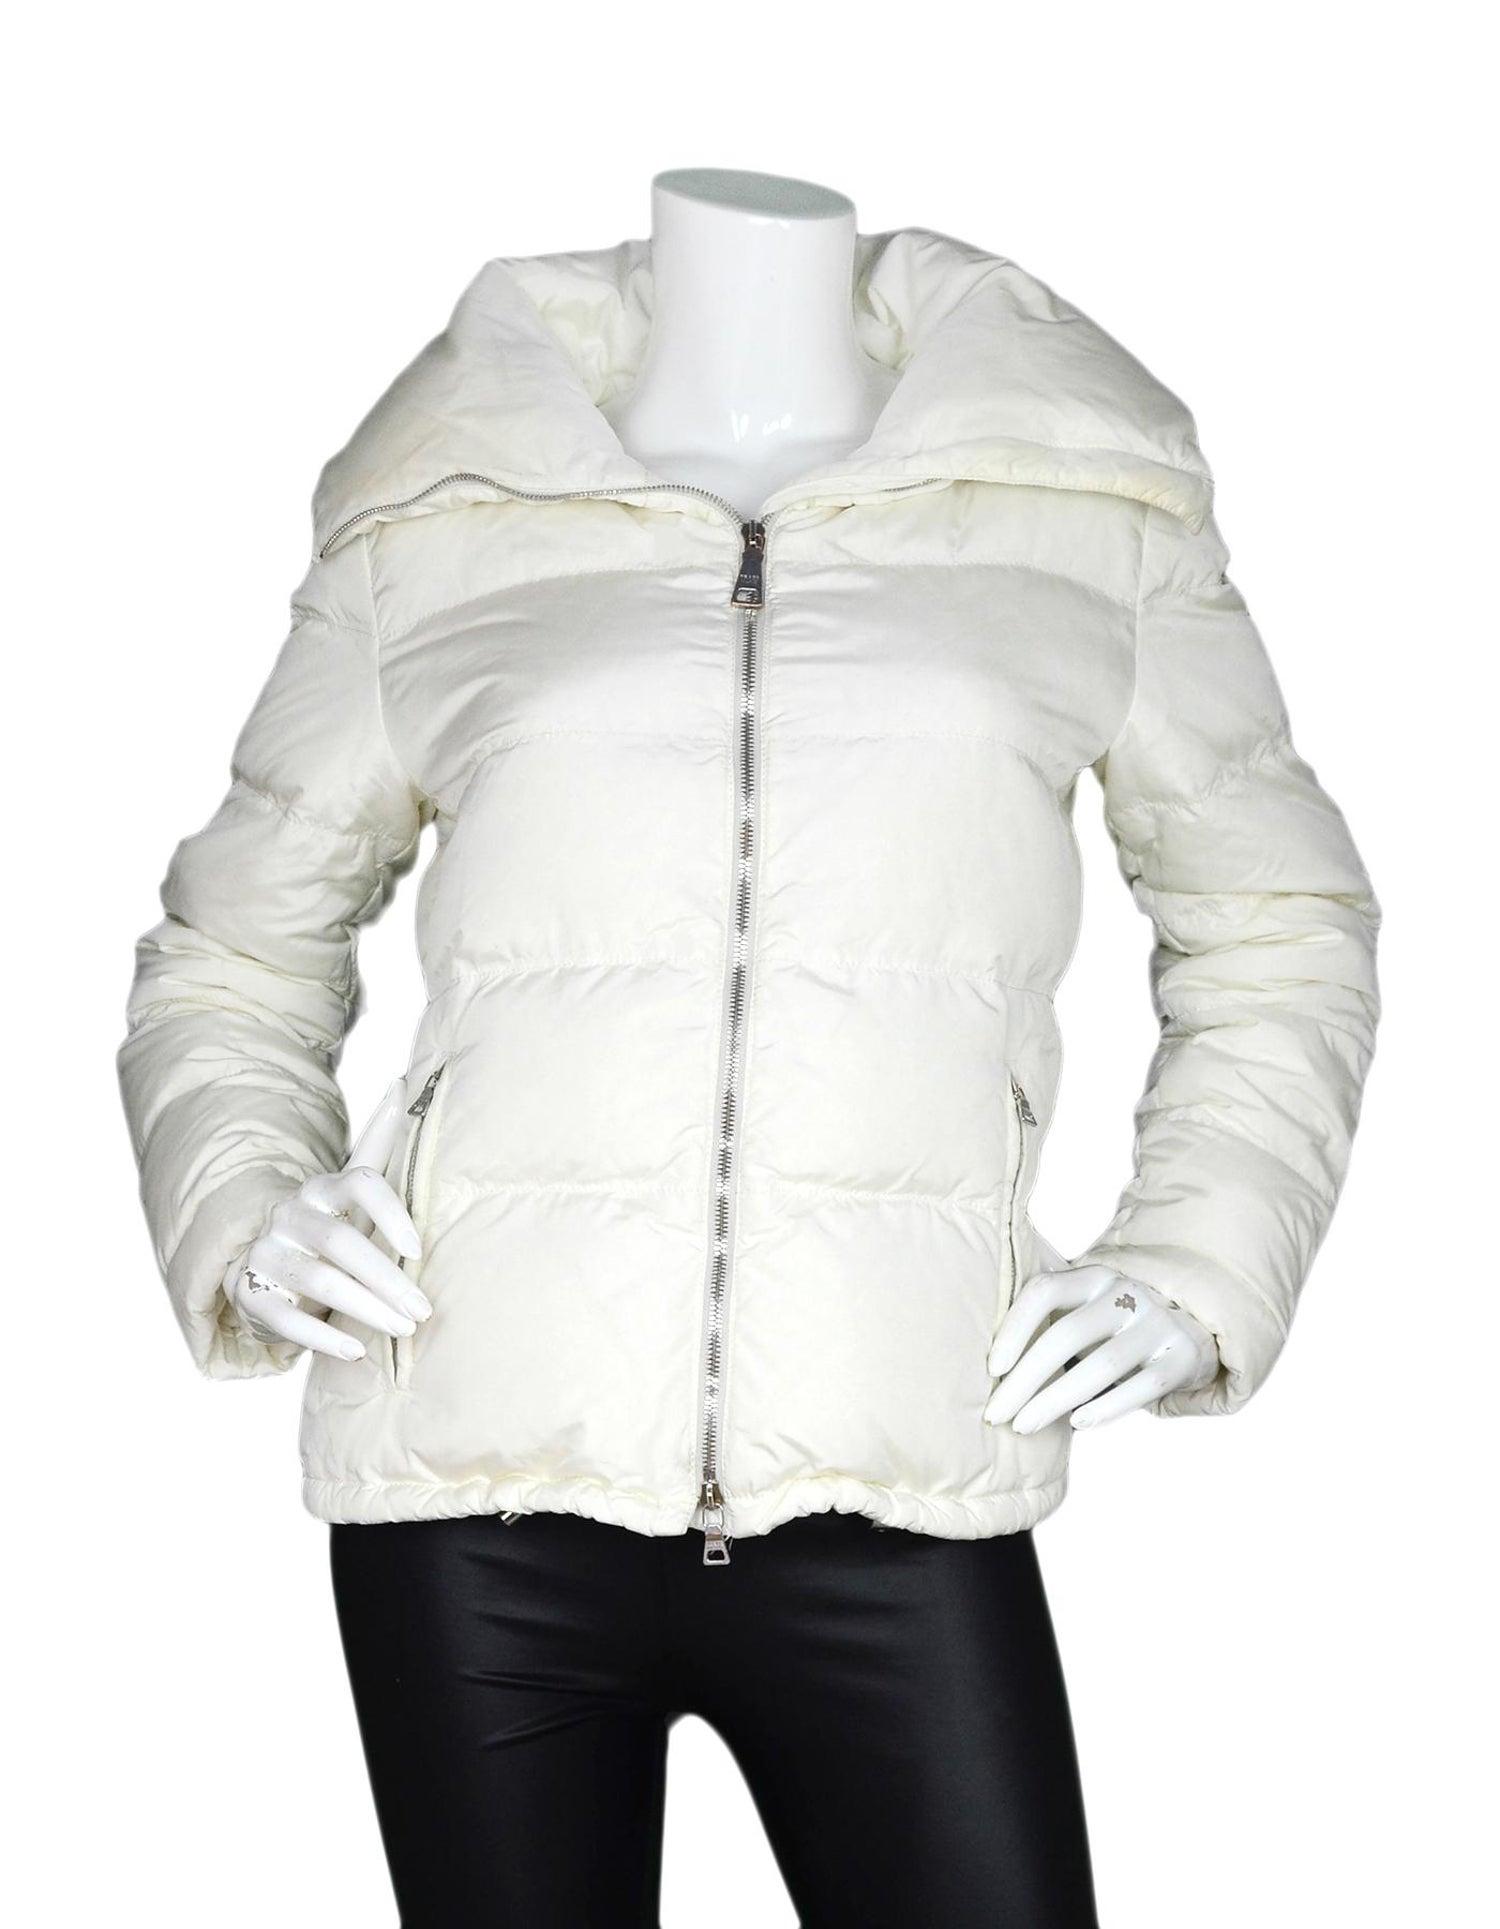 923e218a64c Prada White Down Puffer Jacket Sz 8 For Sale at 1stdibs